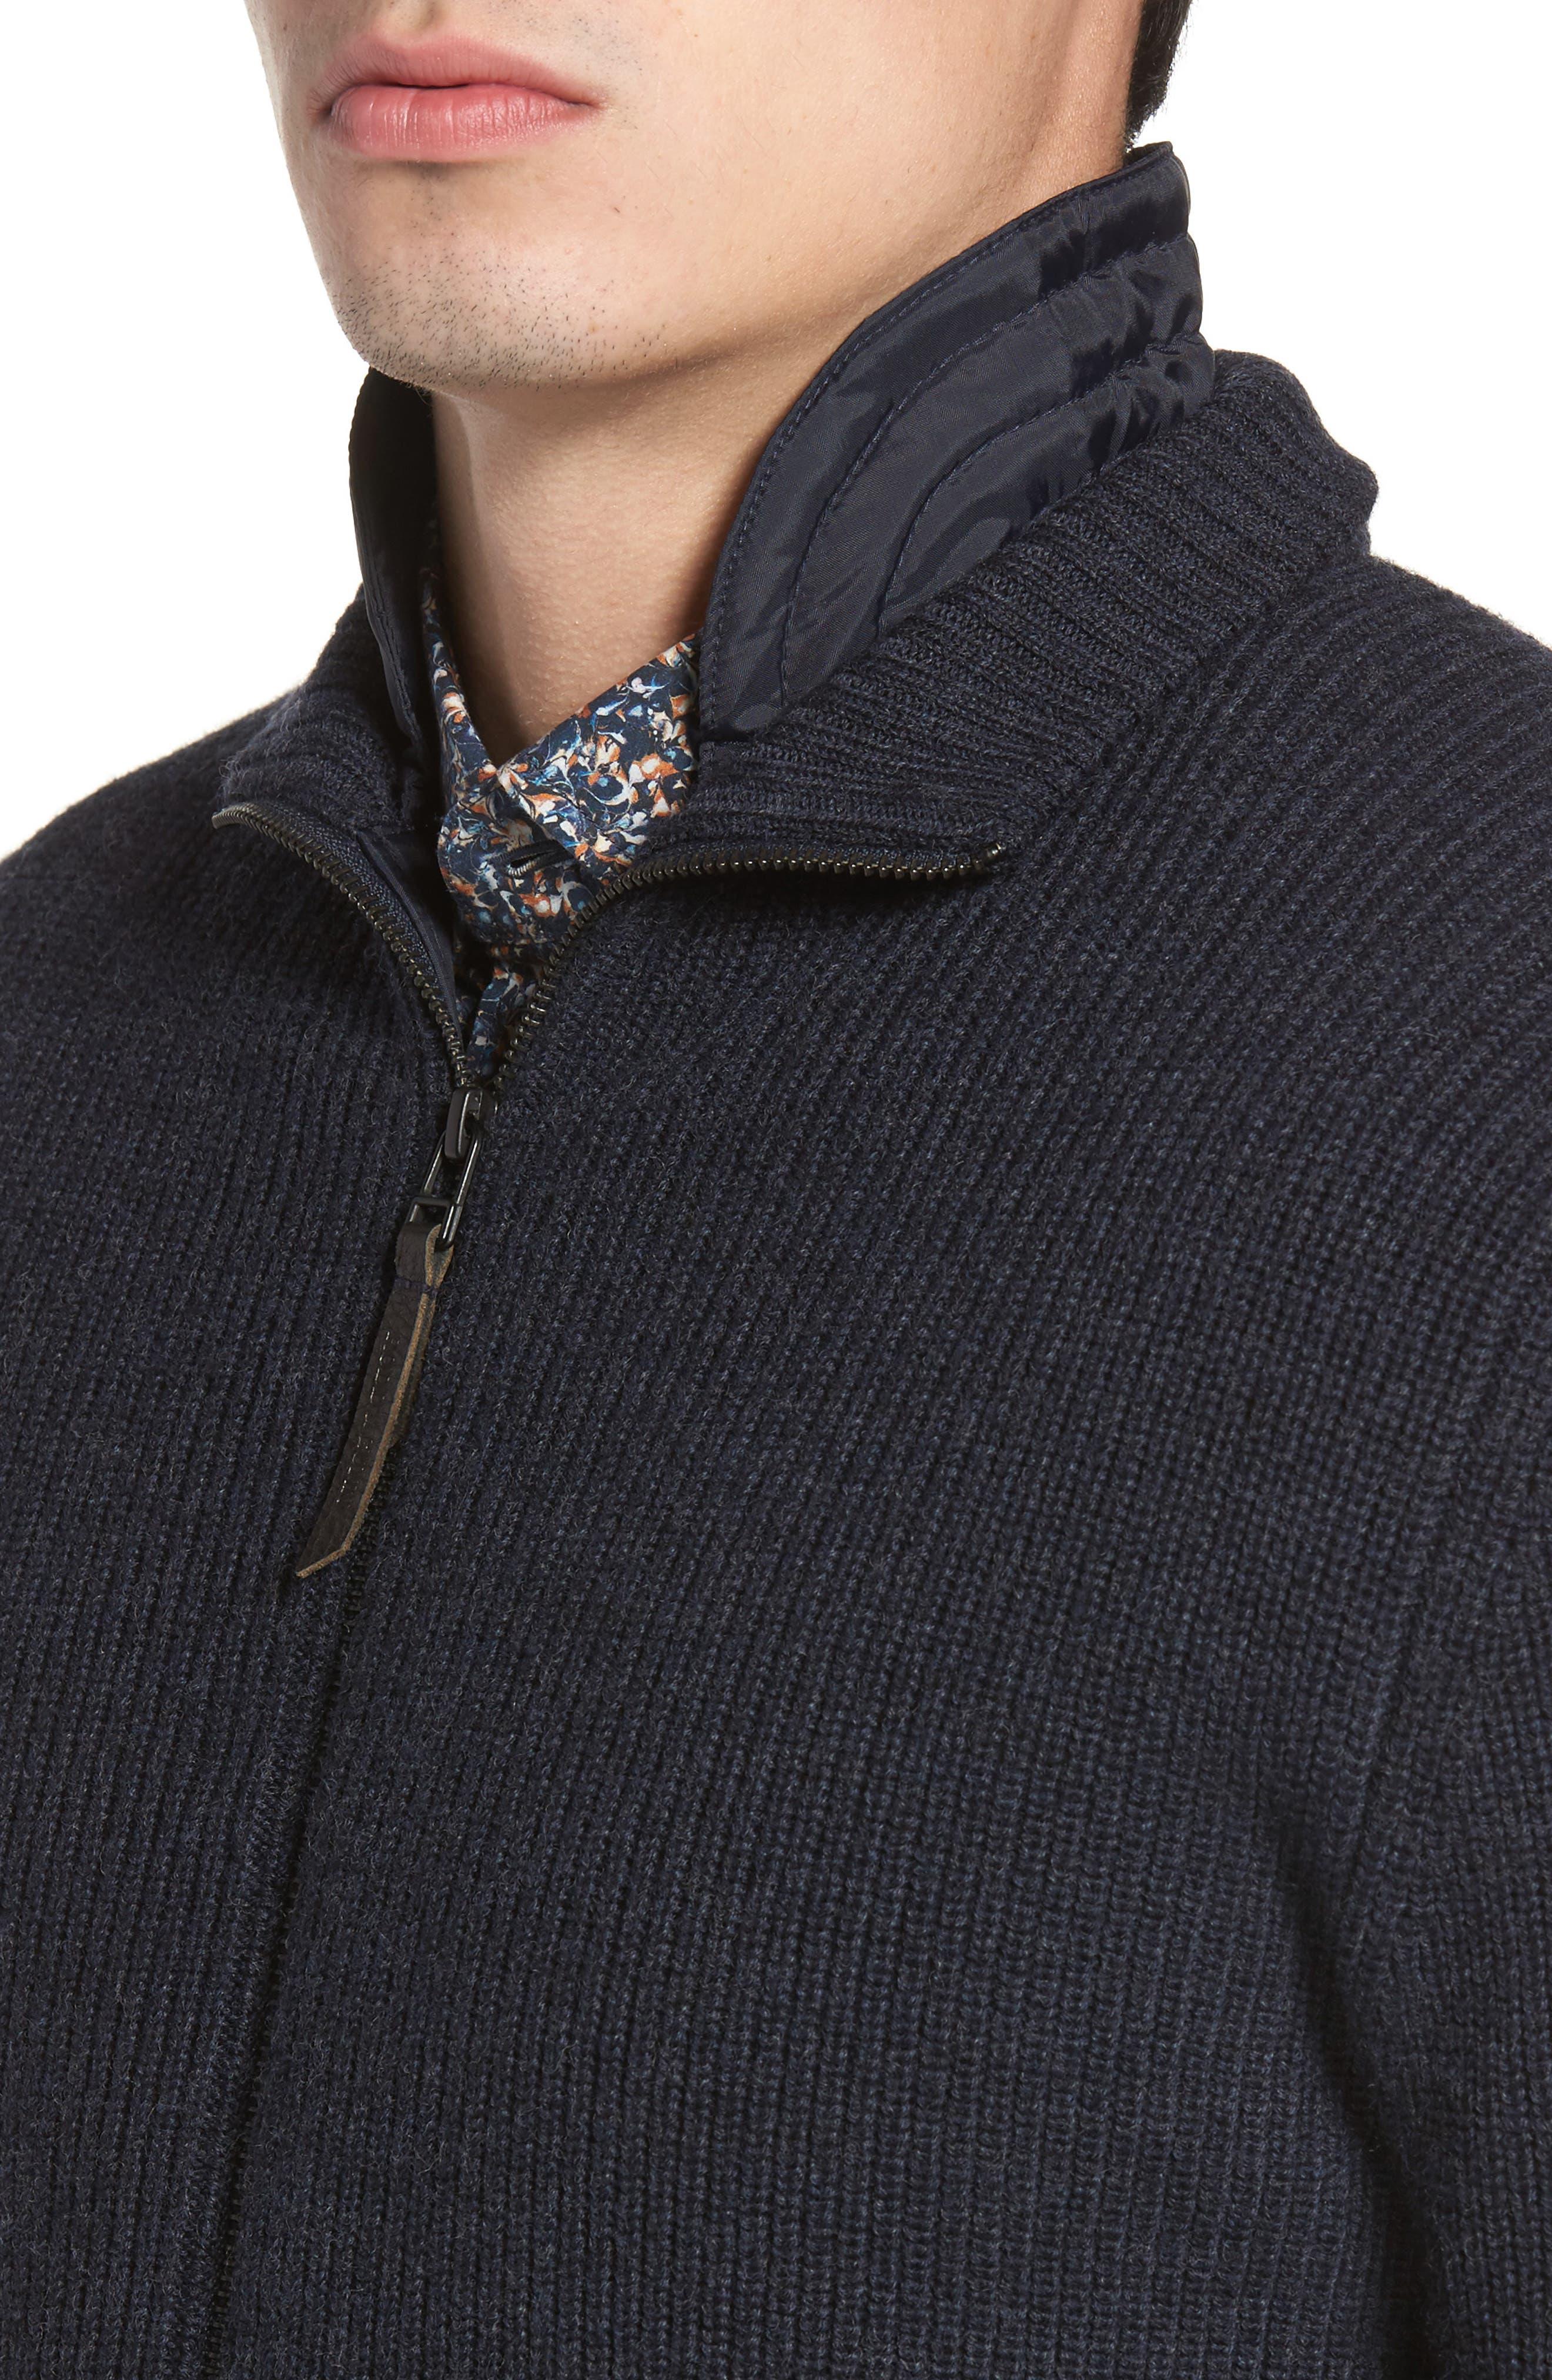 RODD & GUNN, Camerons Track Zip Wool Sweater, Alternate thumbnail 4, color, 412